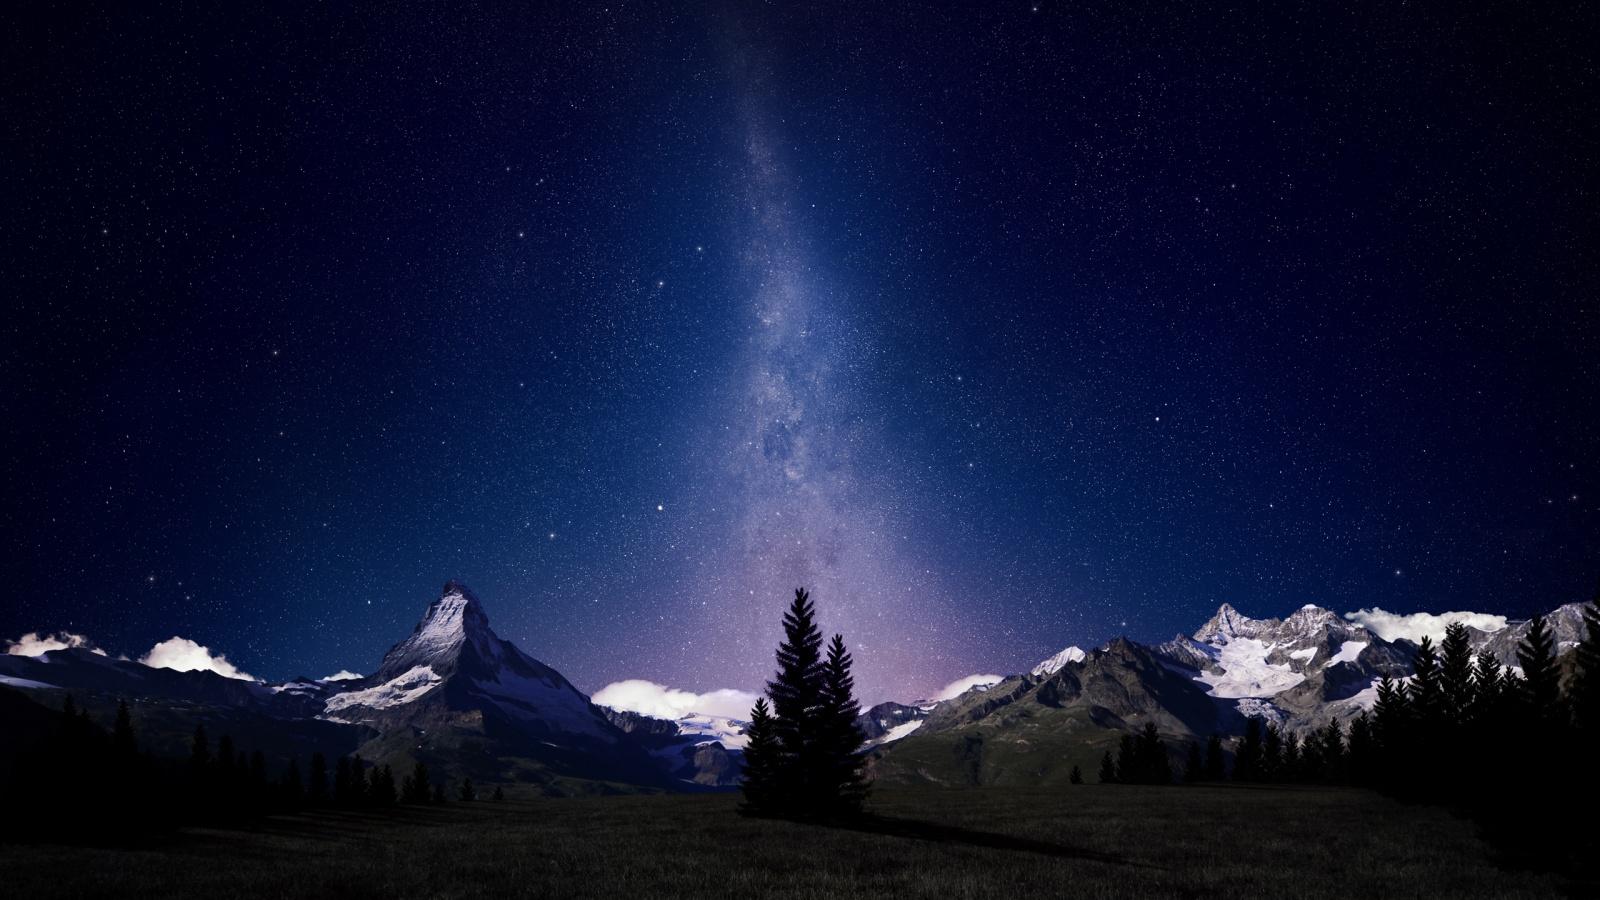 Swiss Alps Night Sky HD Wallpaper